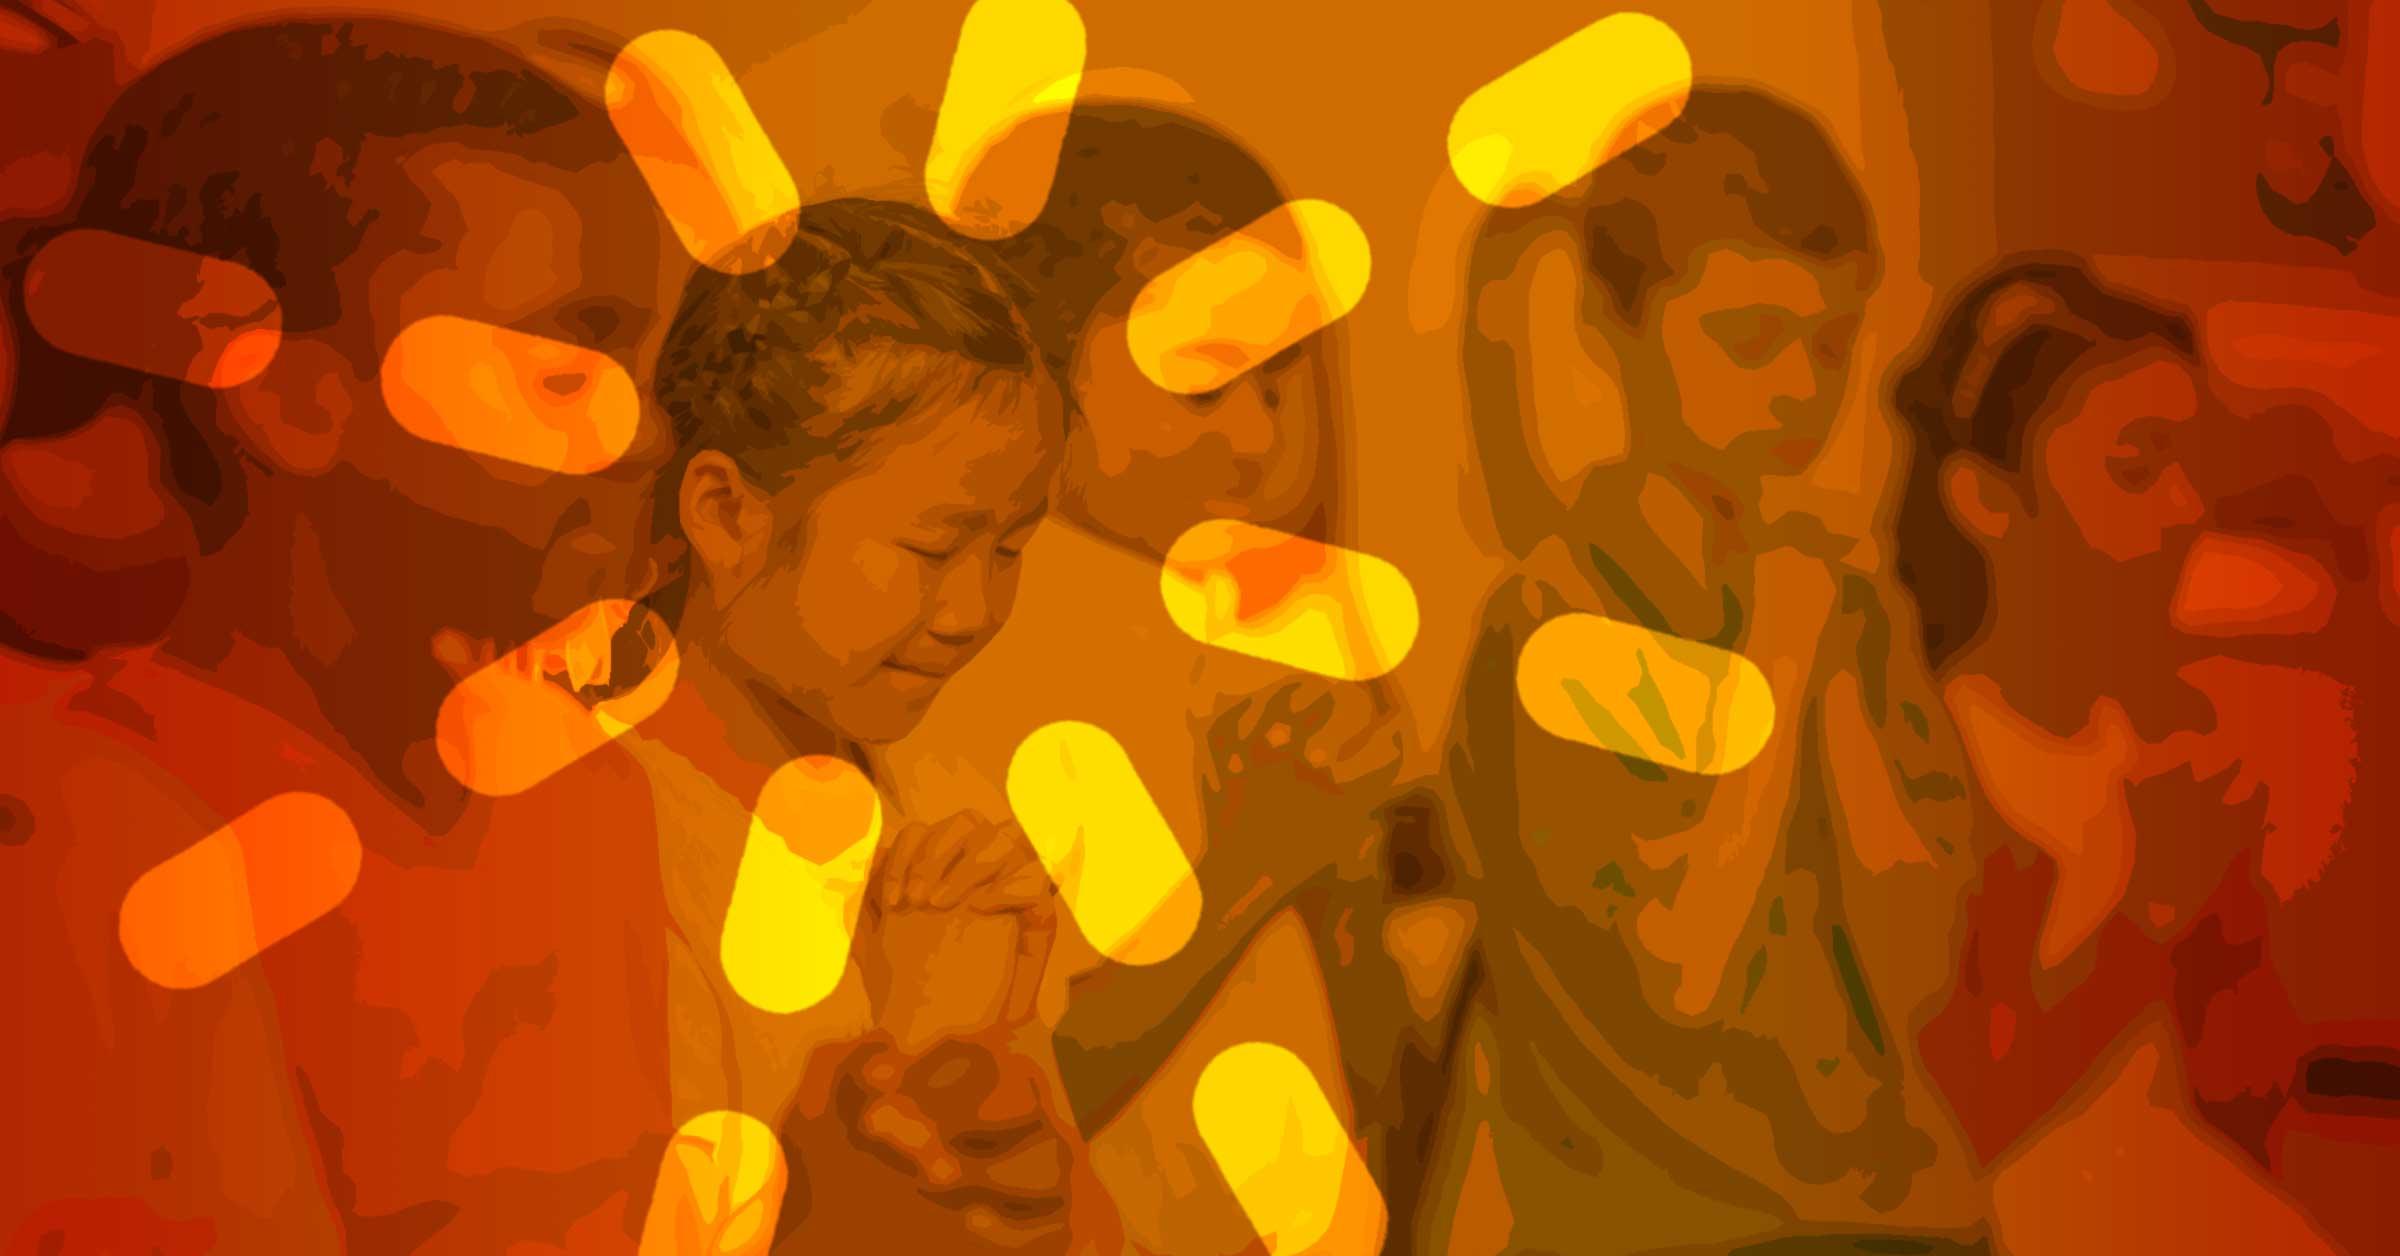 11 creative ideas teaching kids how to pray